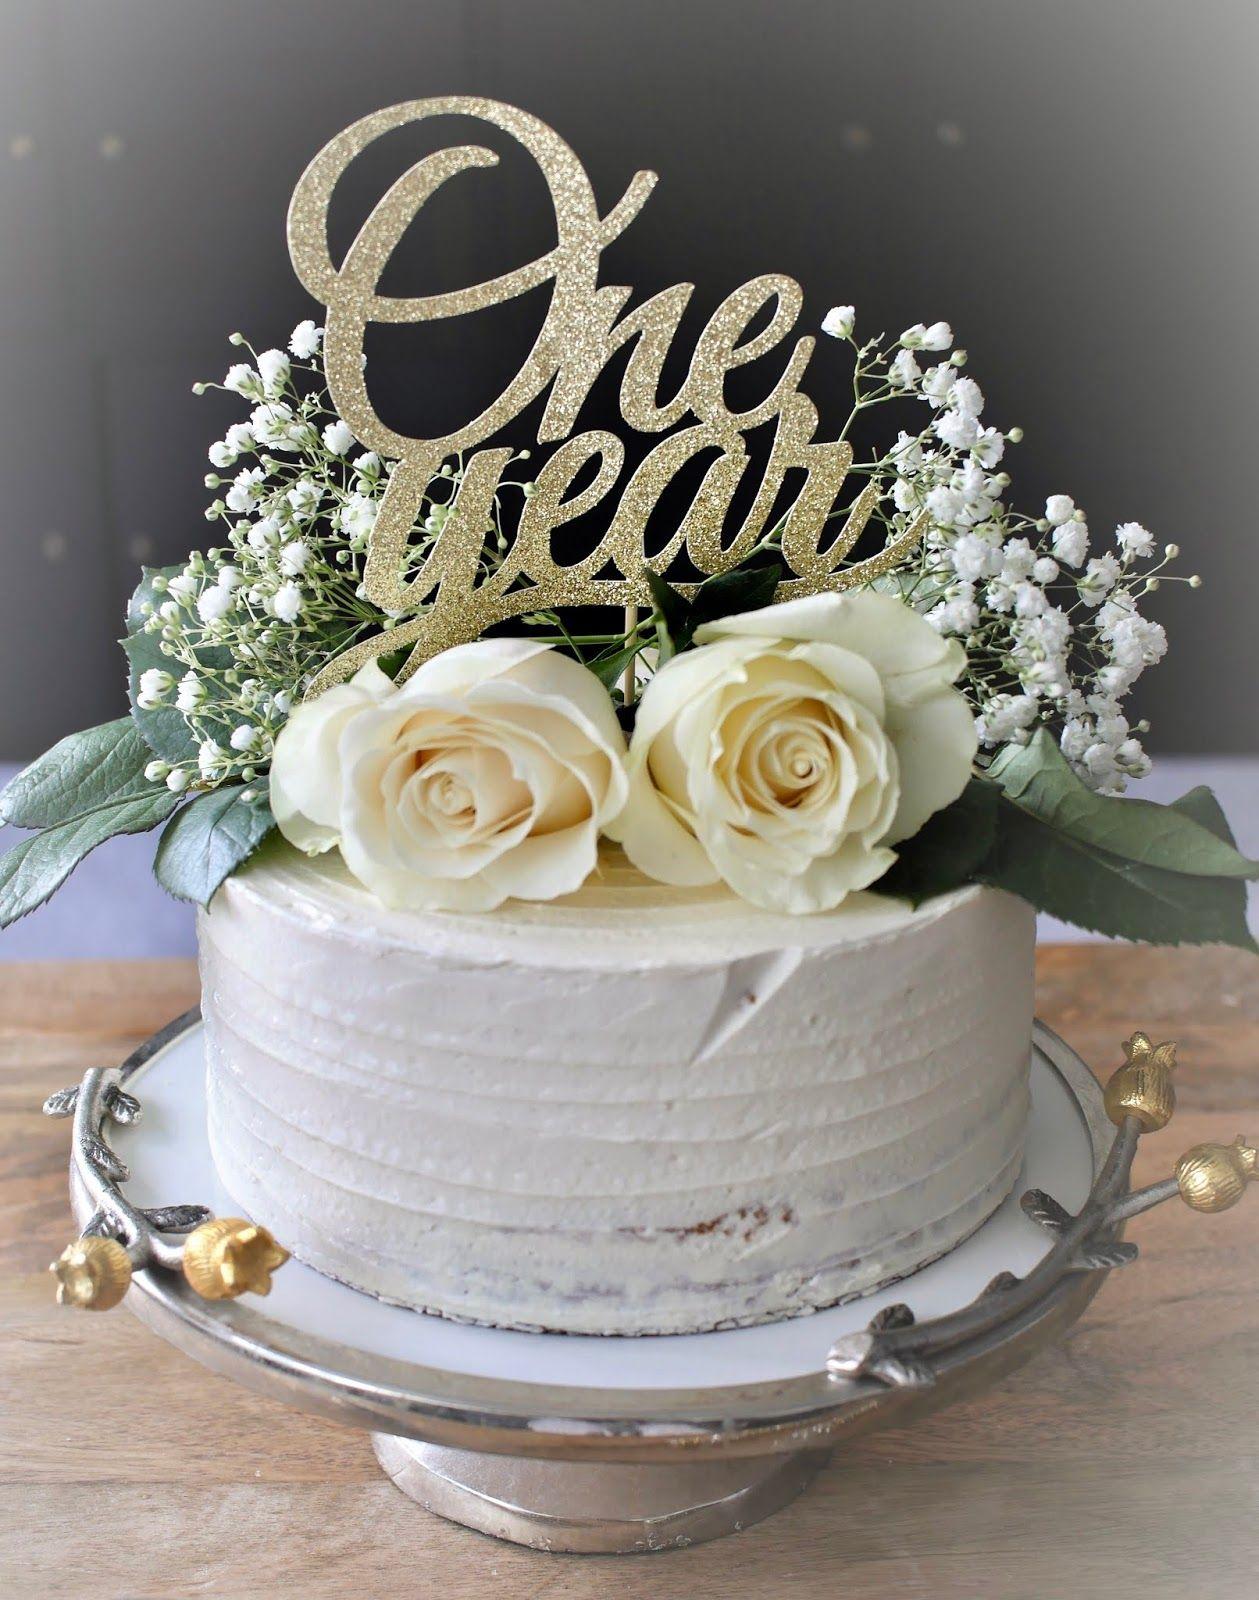 THE URBAN MONARCH 1 Year Wedding Anniversary Cake